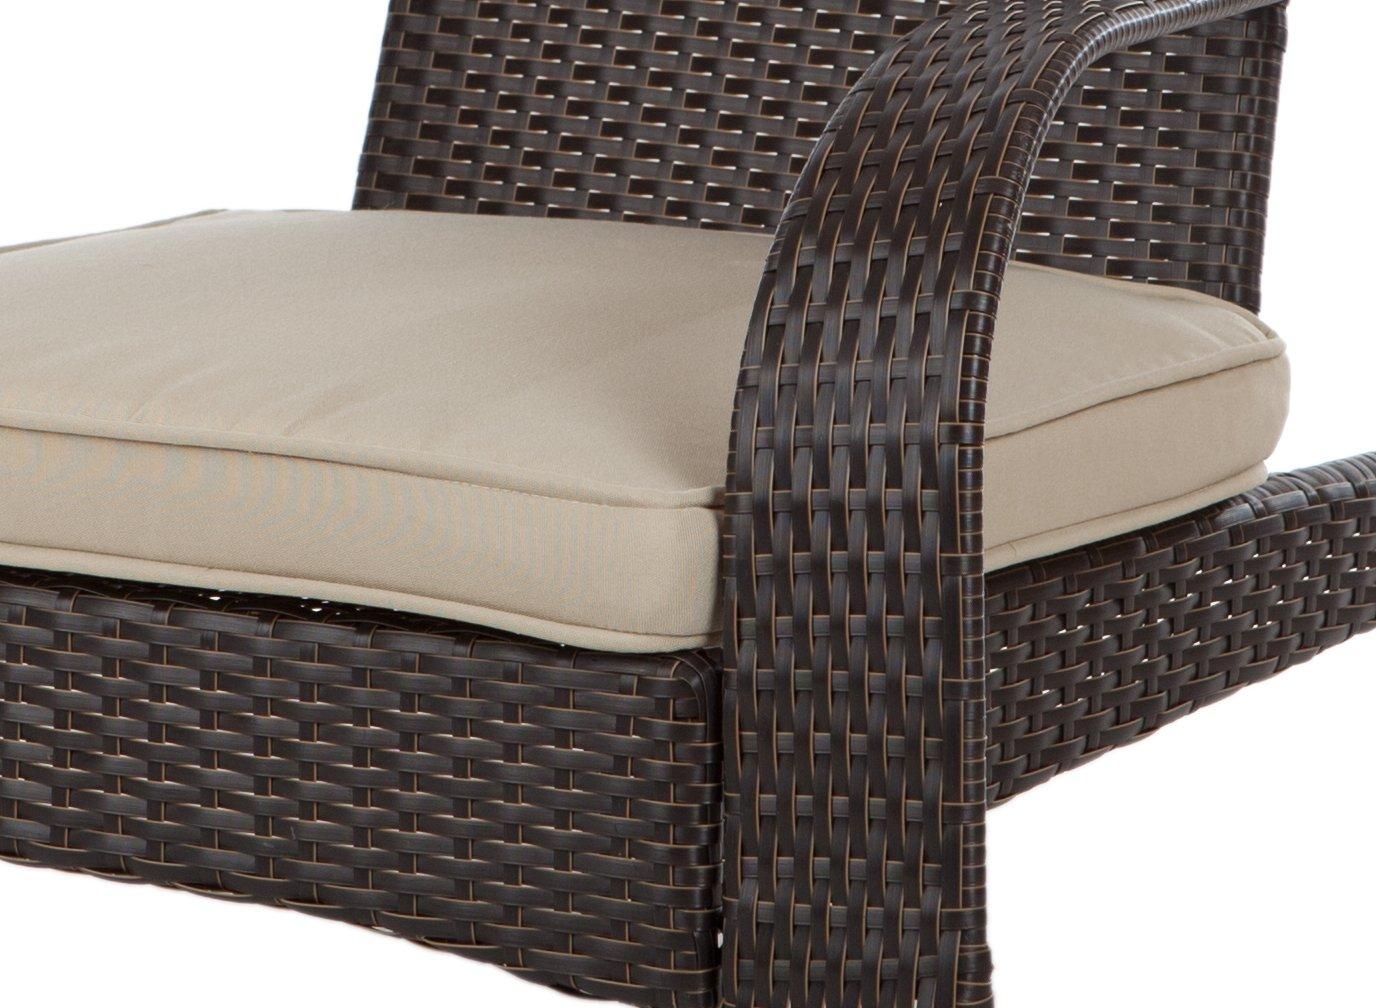 Amazon.com : Patio Sense Coconino Wicker Adirondack Chair : Rocking Chair :  Garden U0026 Outdoor